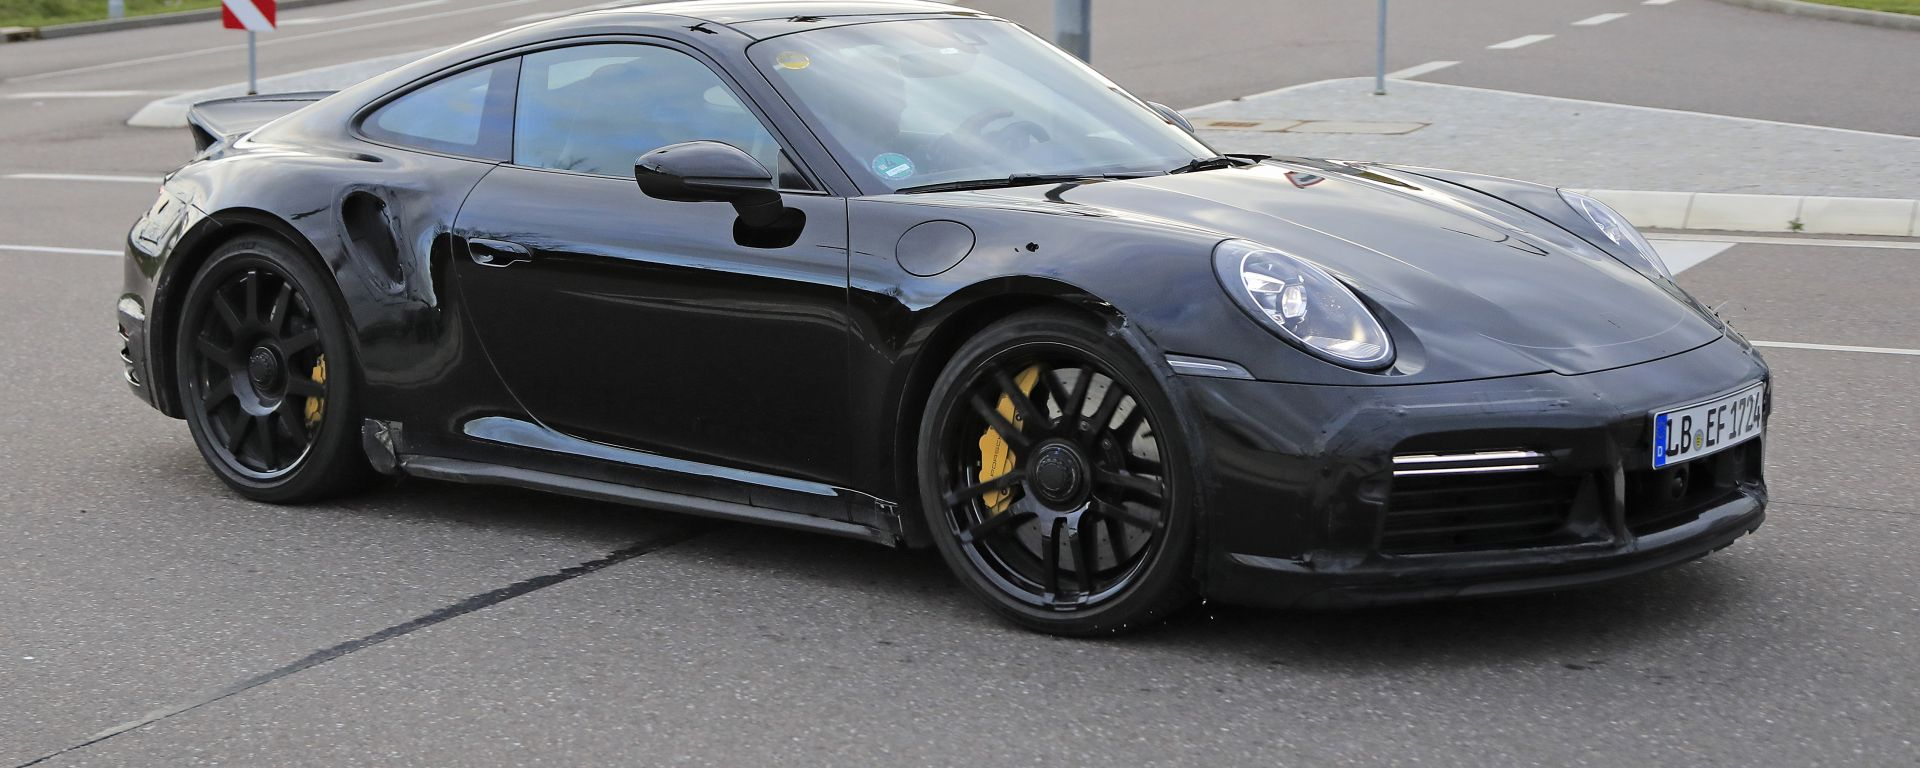 Porsche 911 Turbo S Dicktail: vista 3/4 anteriore